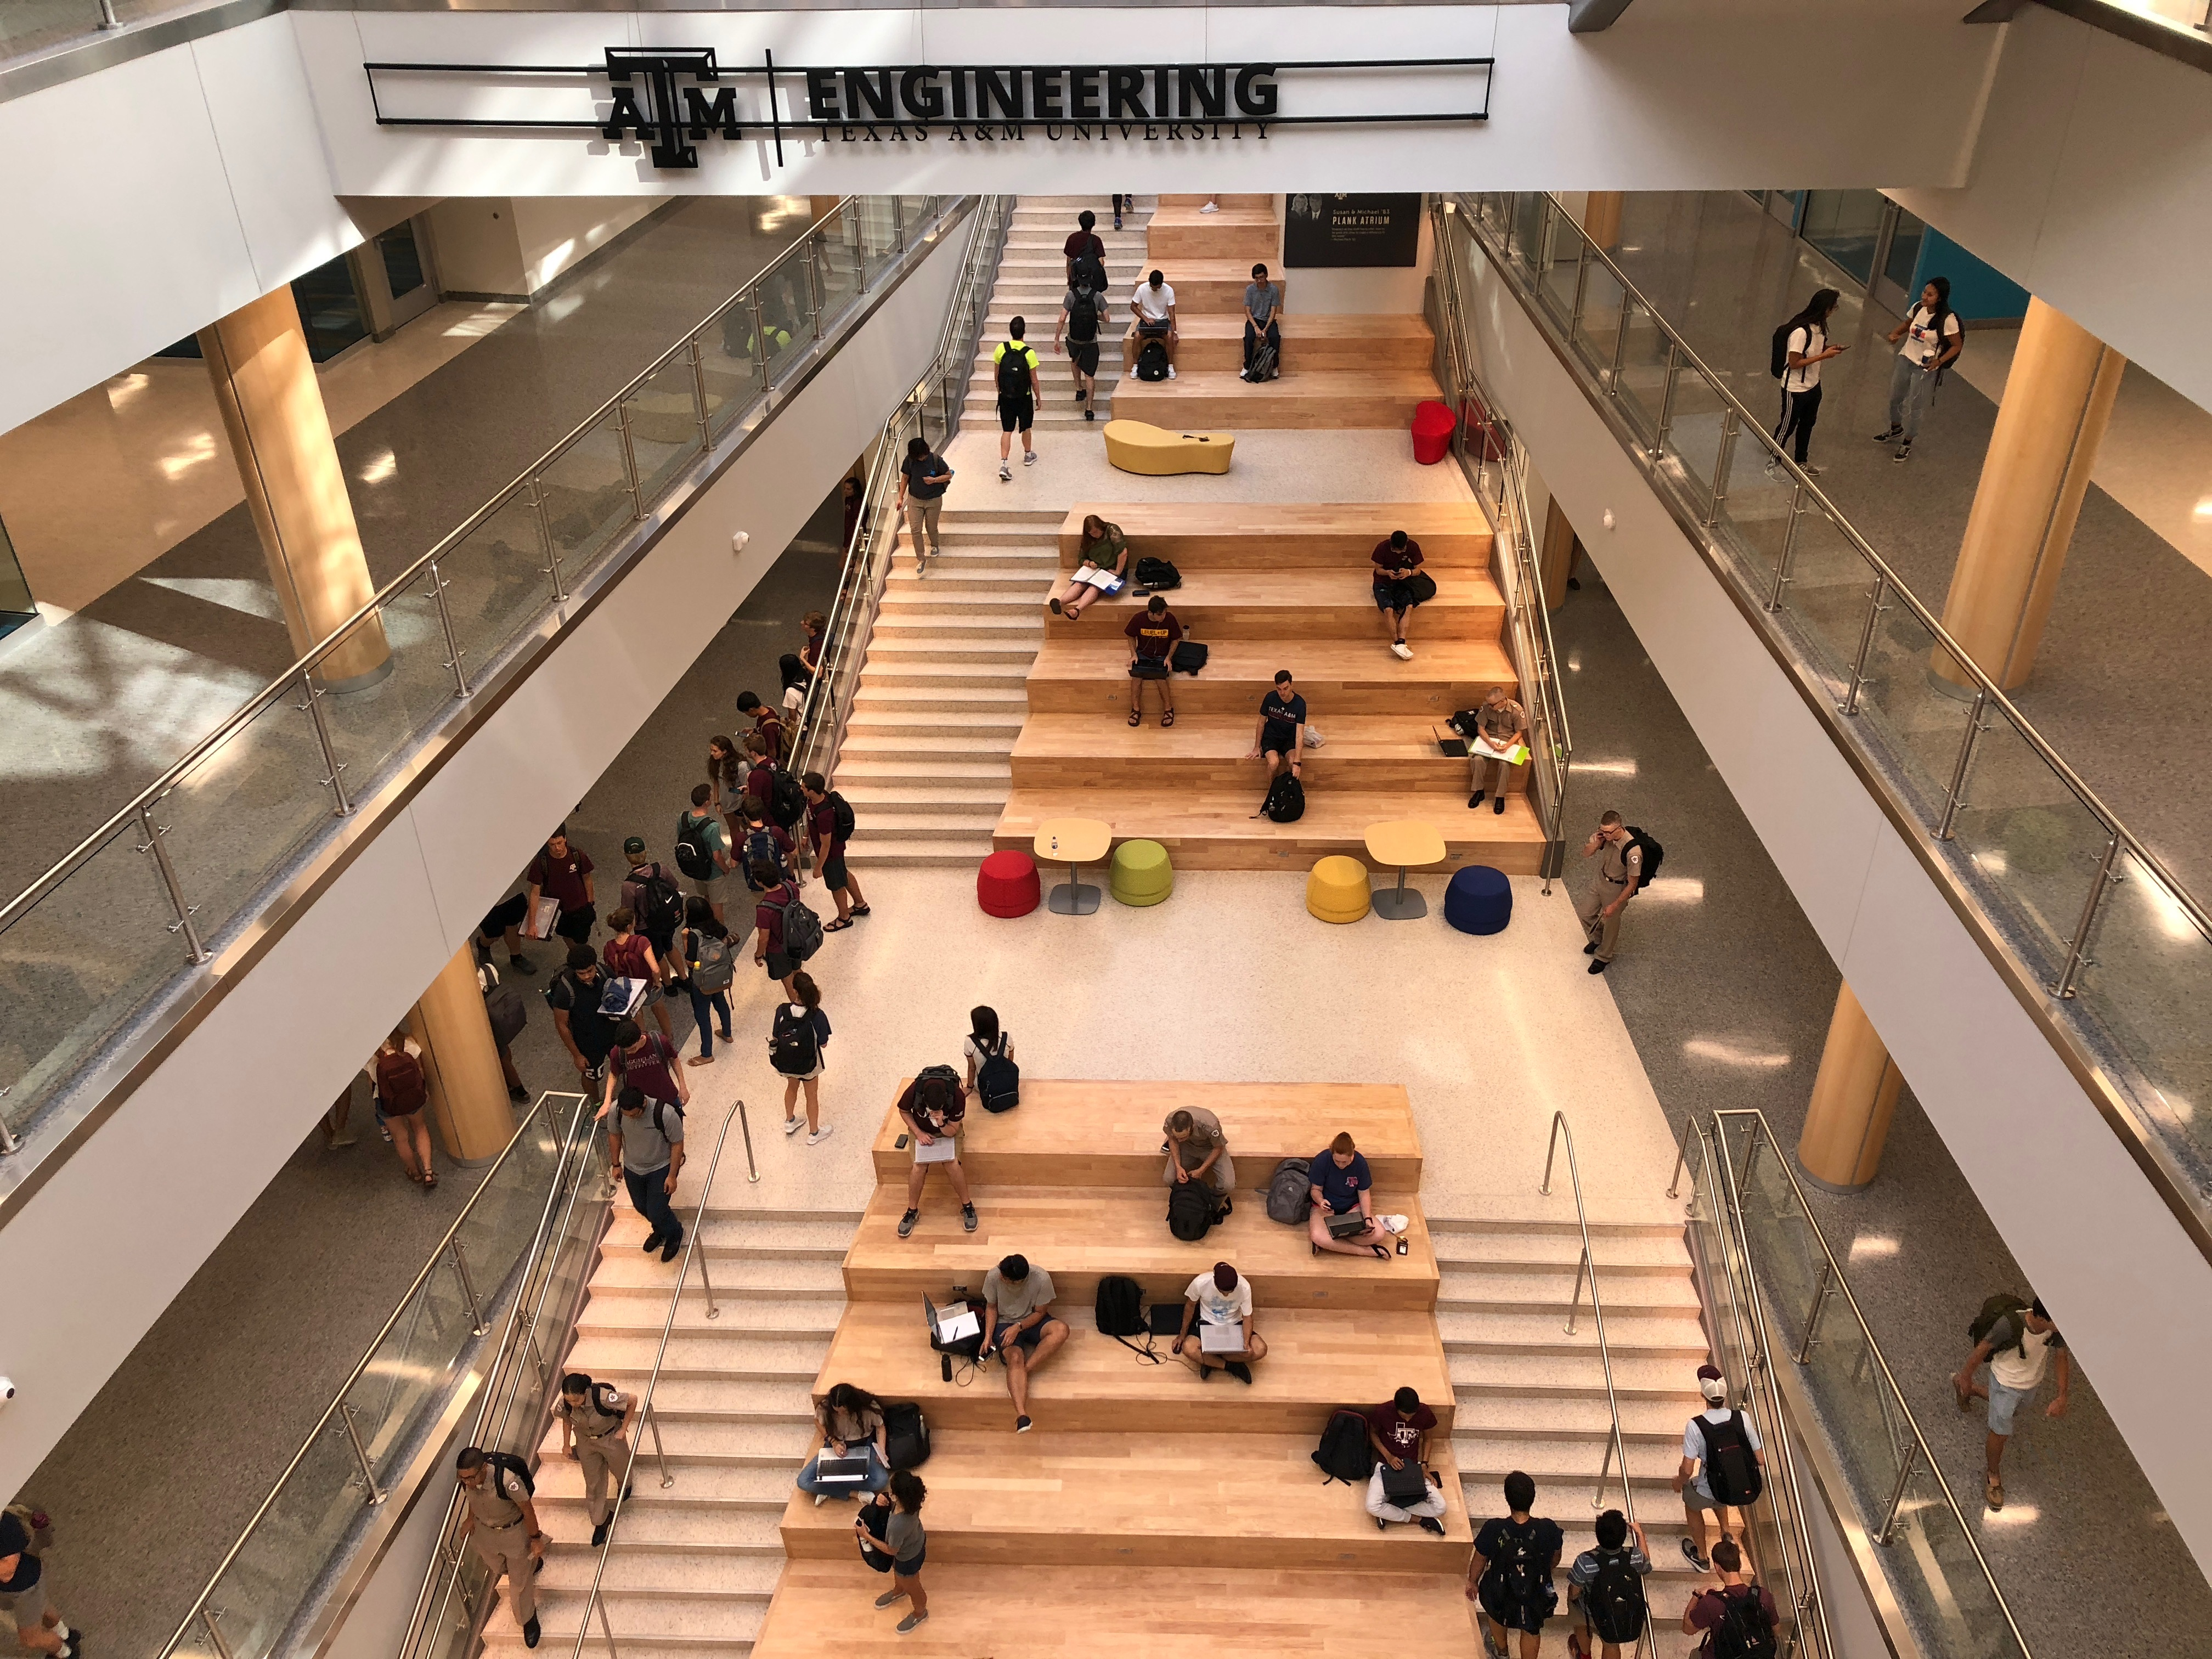 Atrium-Zachry-Engineering-students-satellite-students-campuses (2)